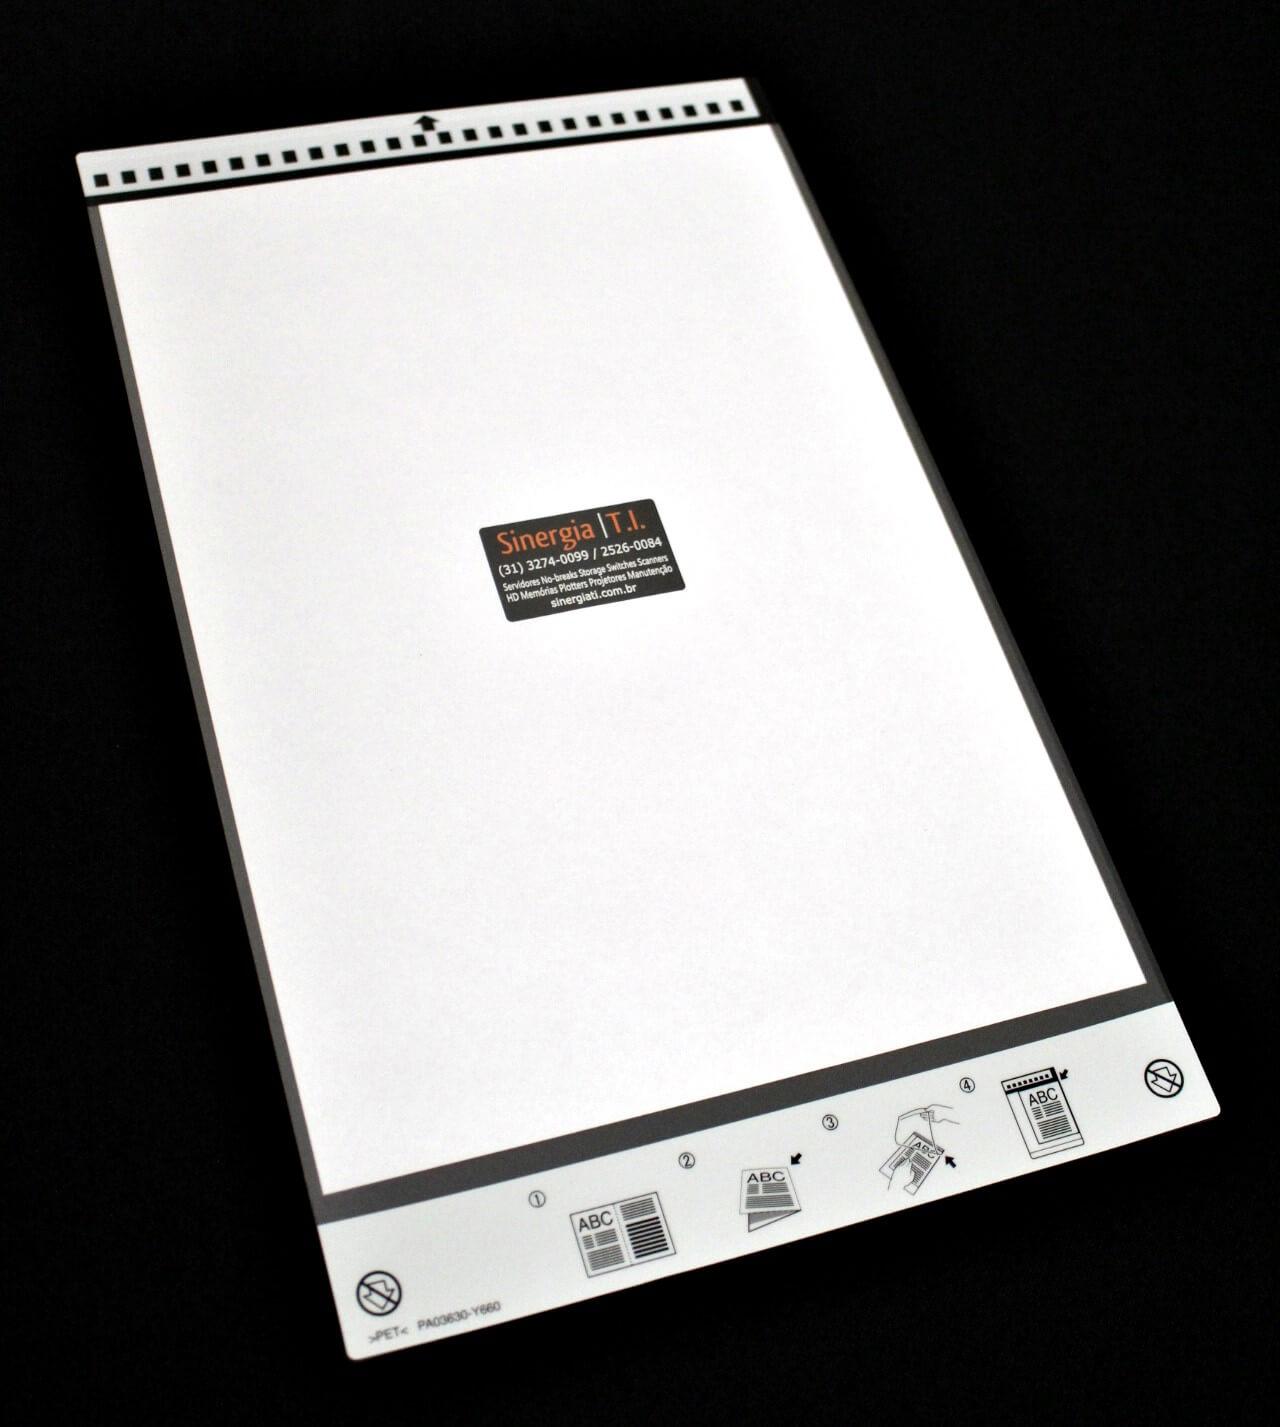 PA03360-0013 Folha de Transporte Carrier Sheet para Scanners Fujitsu A3 PA03630-F661